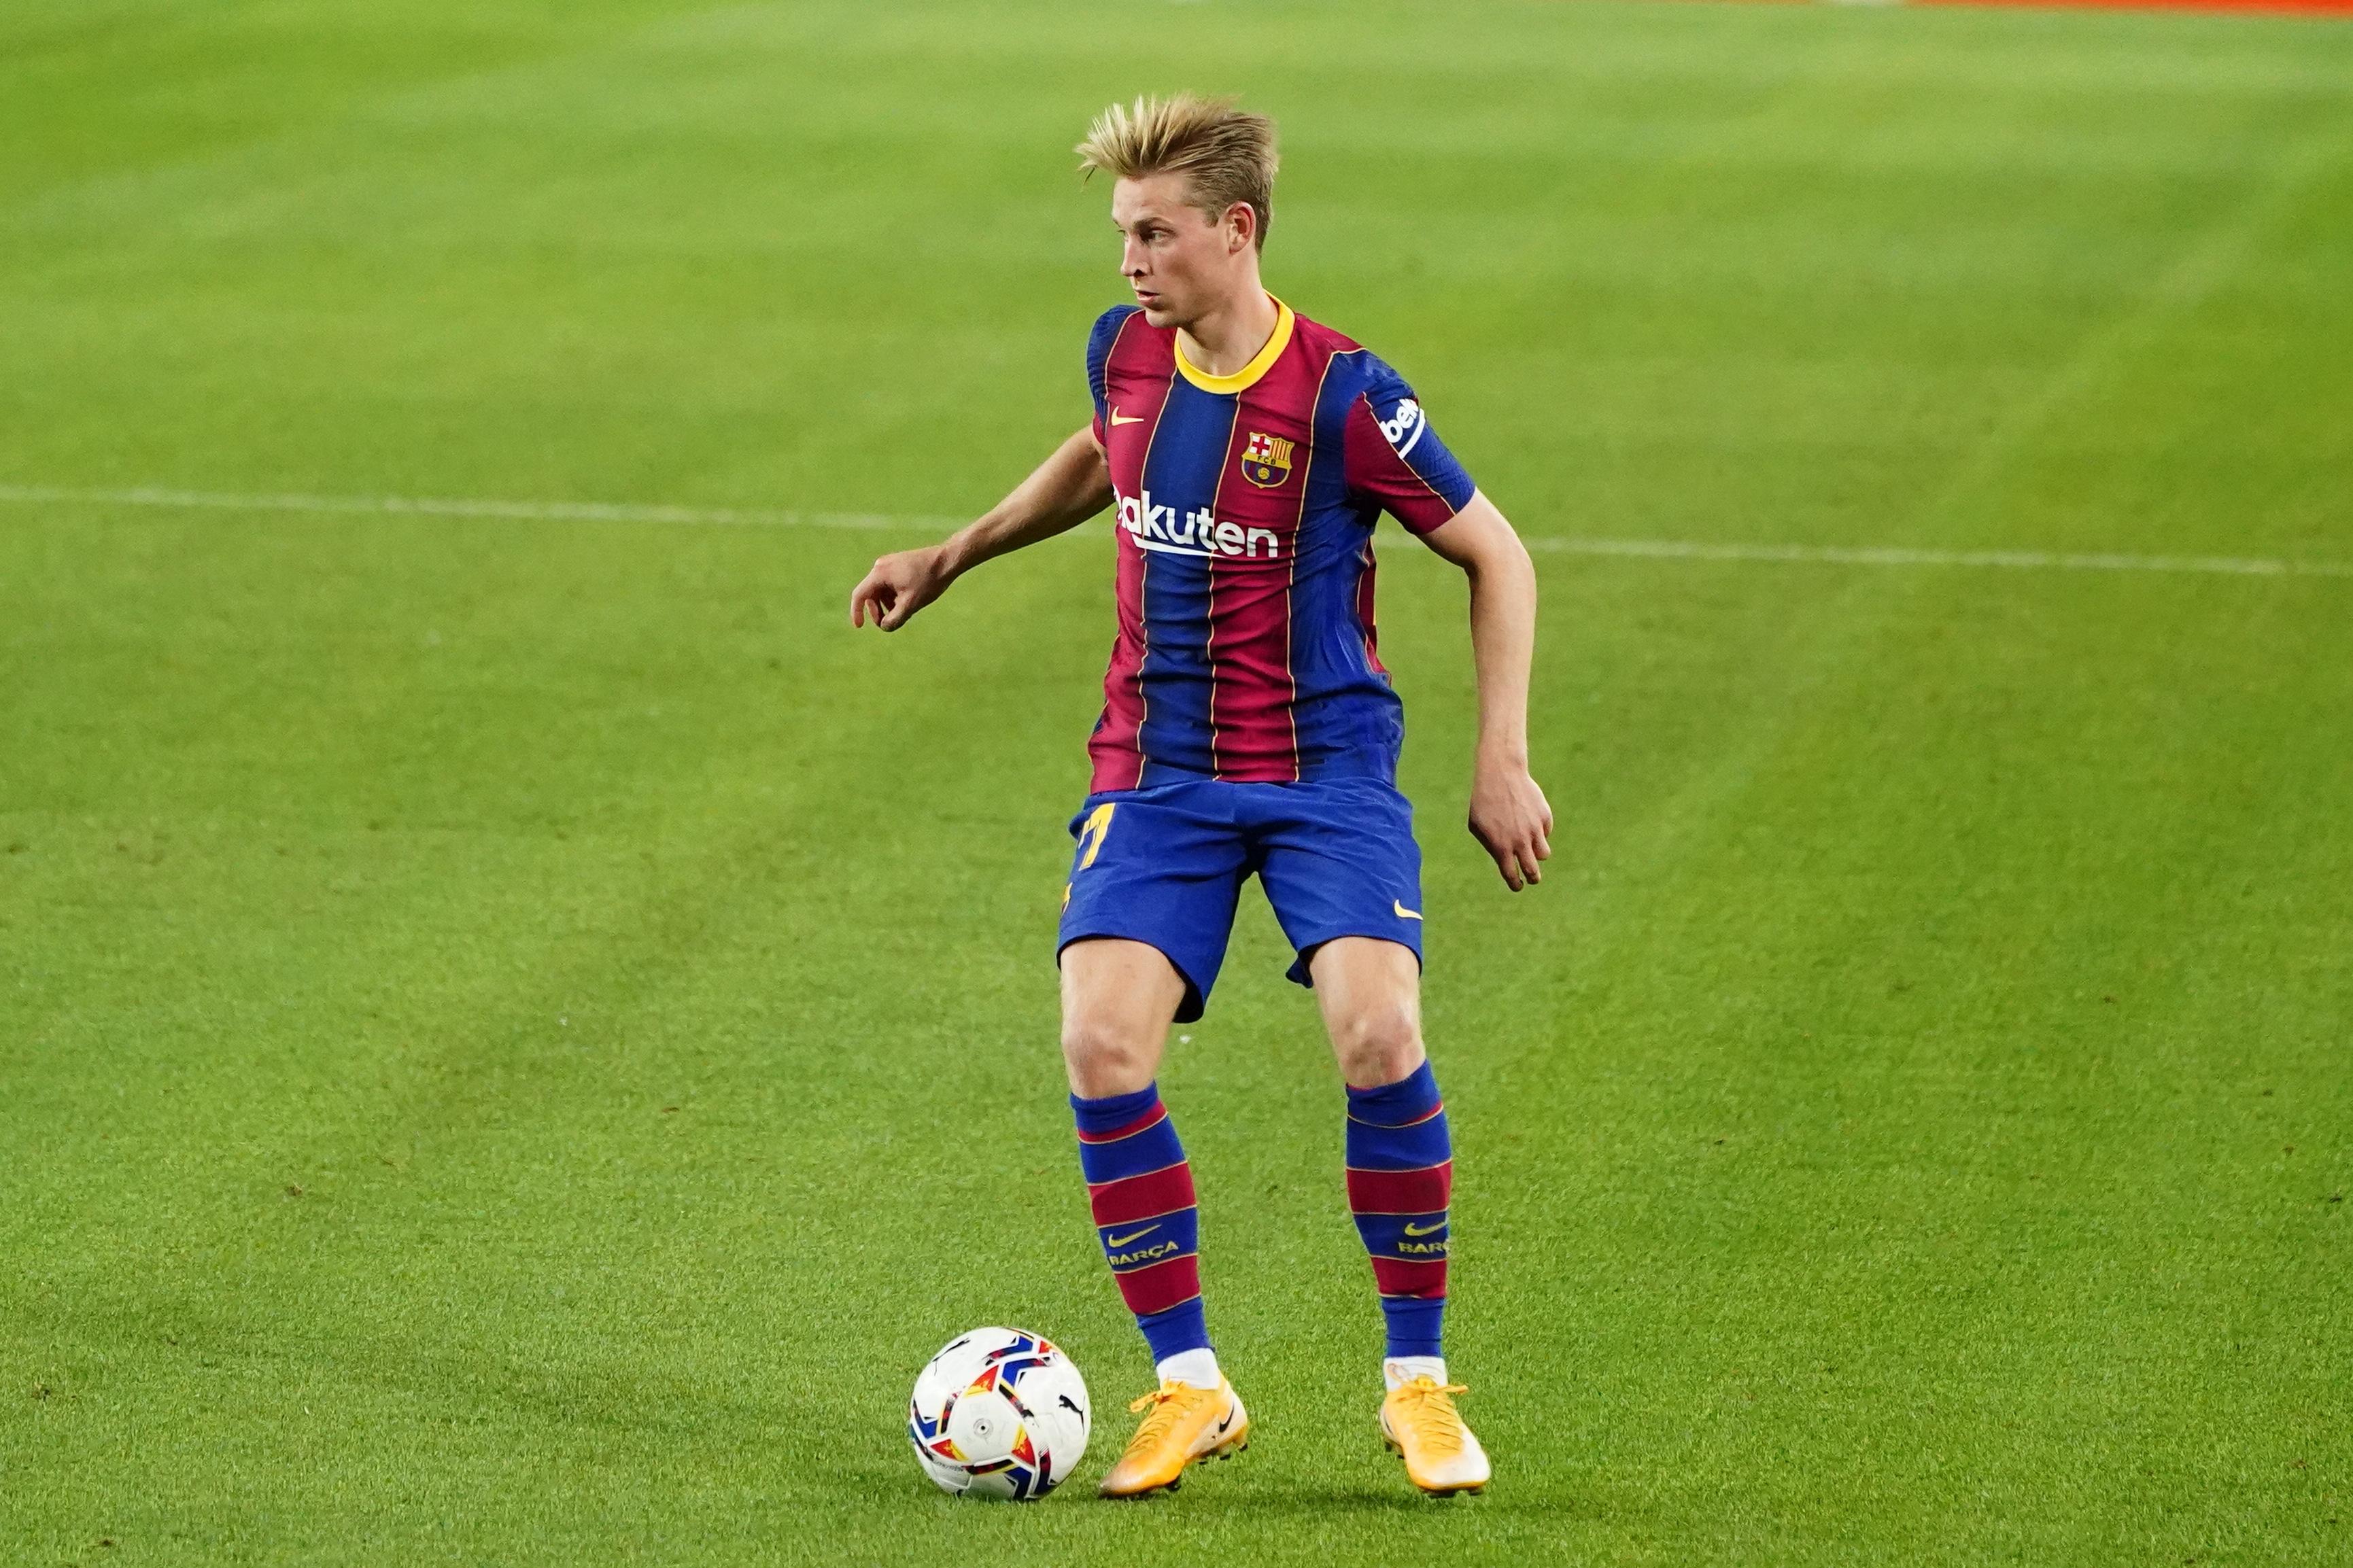 Frenkie de Jong (FC <a href='/clubs/barcelona'>Barcelona</a>).jpeg